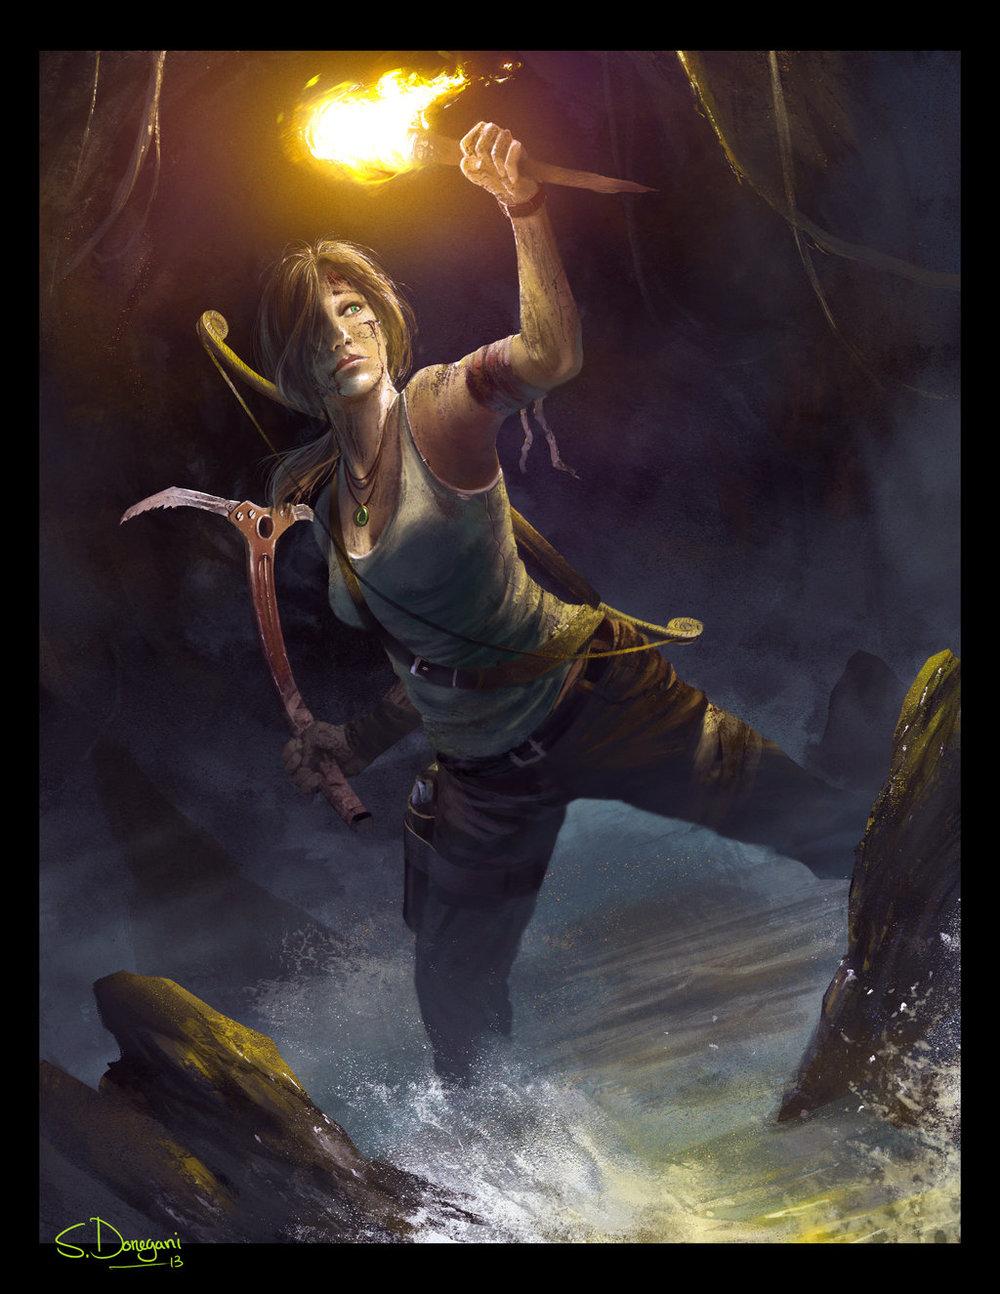 tomb_raider_reborn_by_steven_donegani-d5y19h4.jpg